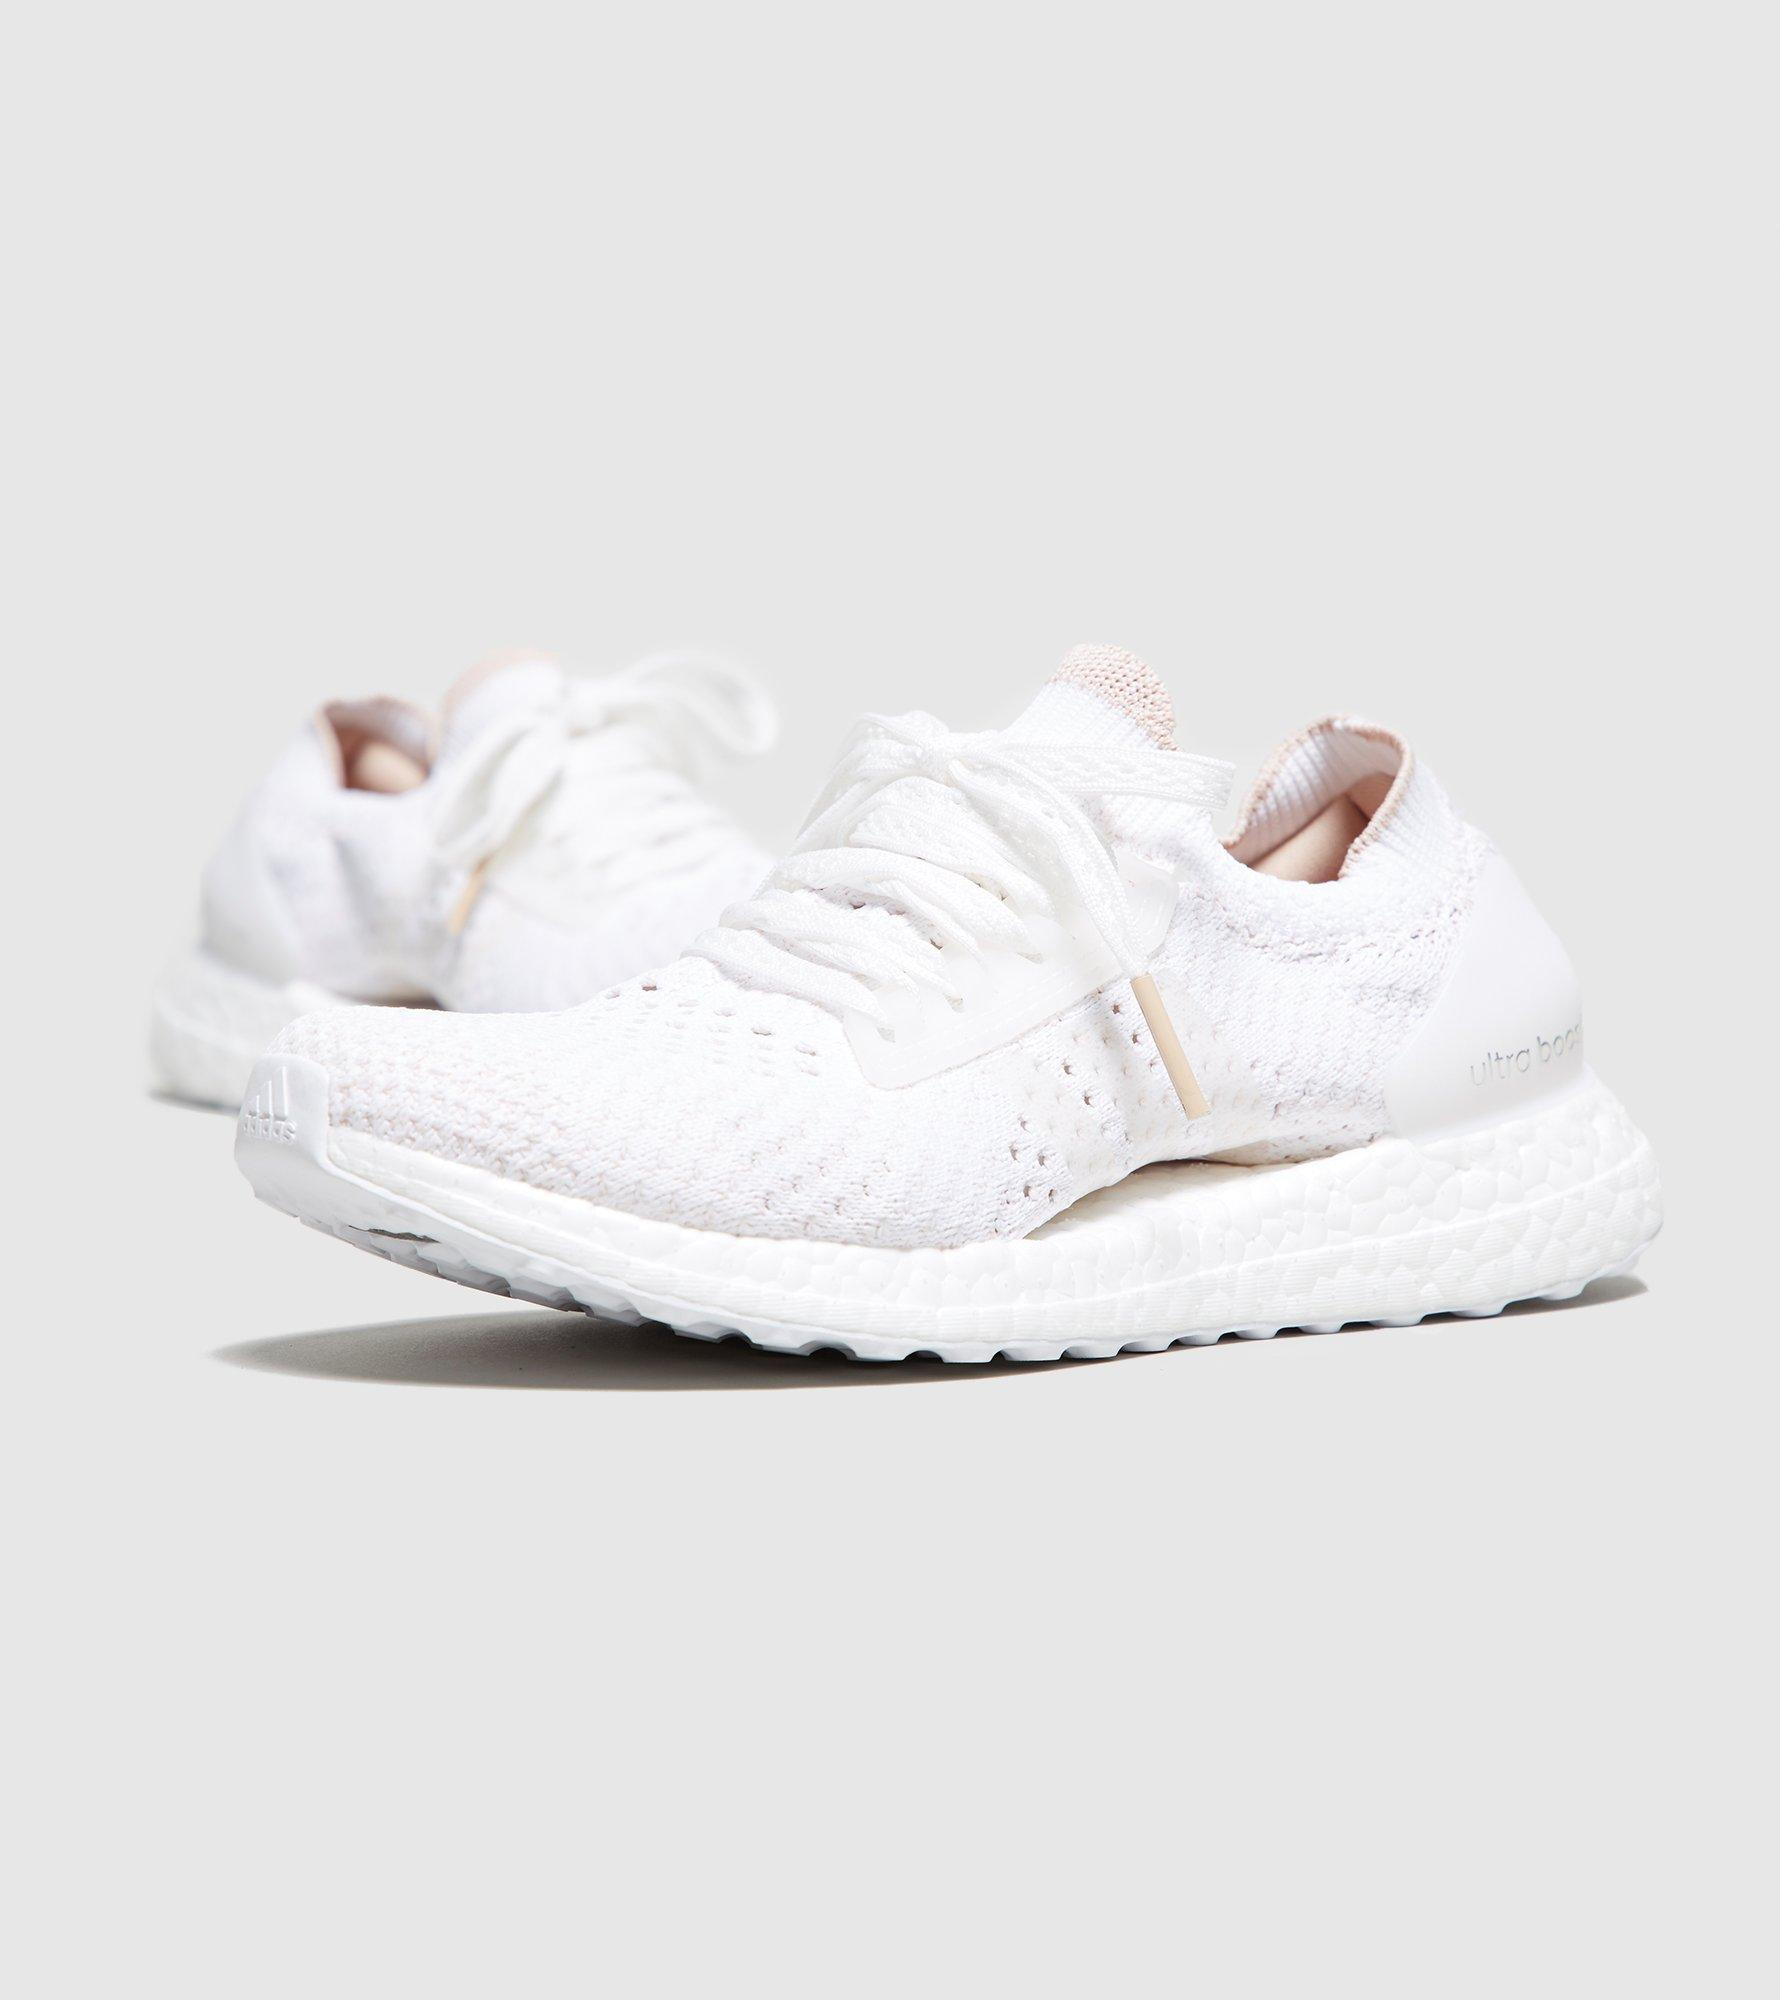 98ef02f526 Adidas White Ultra Boost X Clima Women's